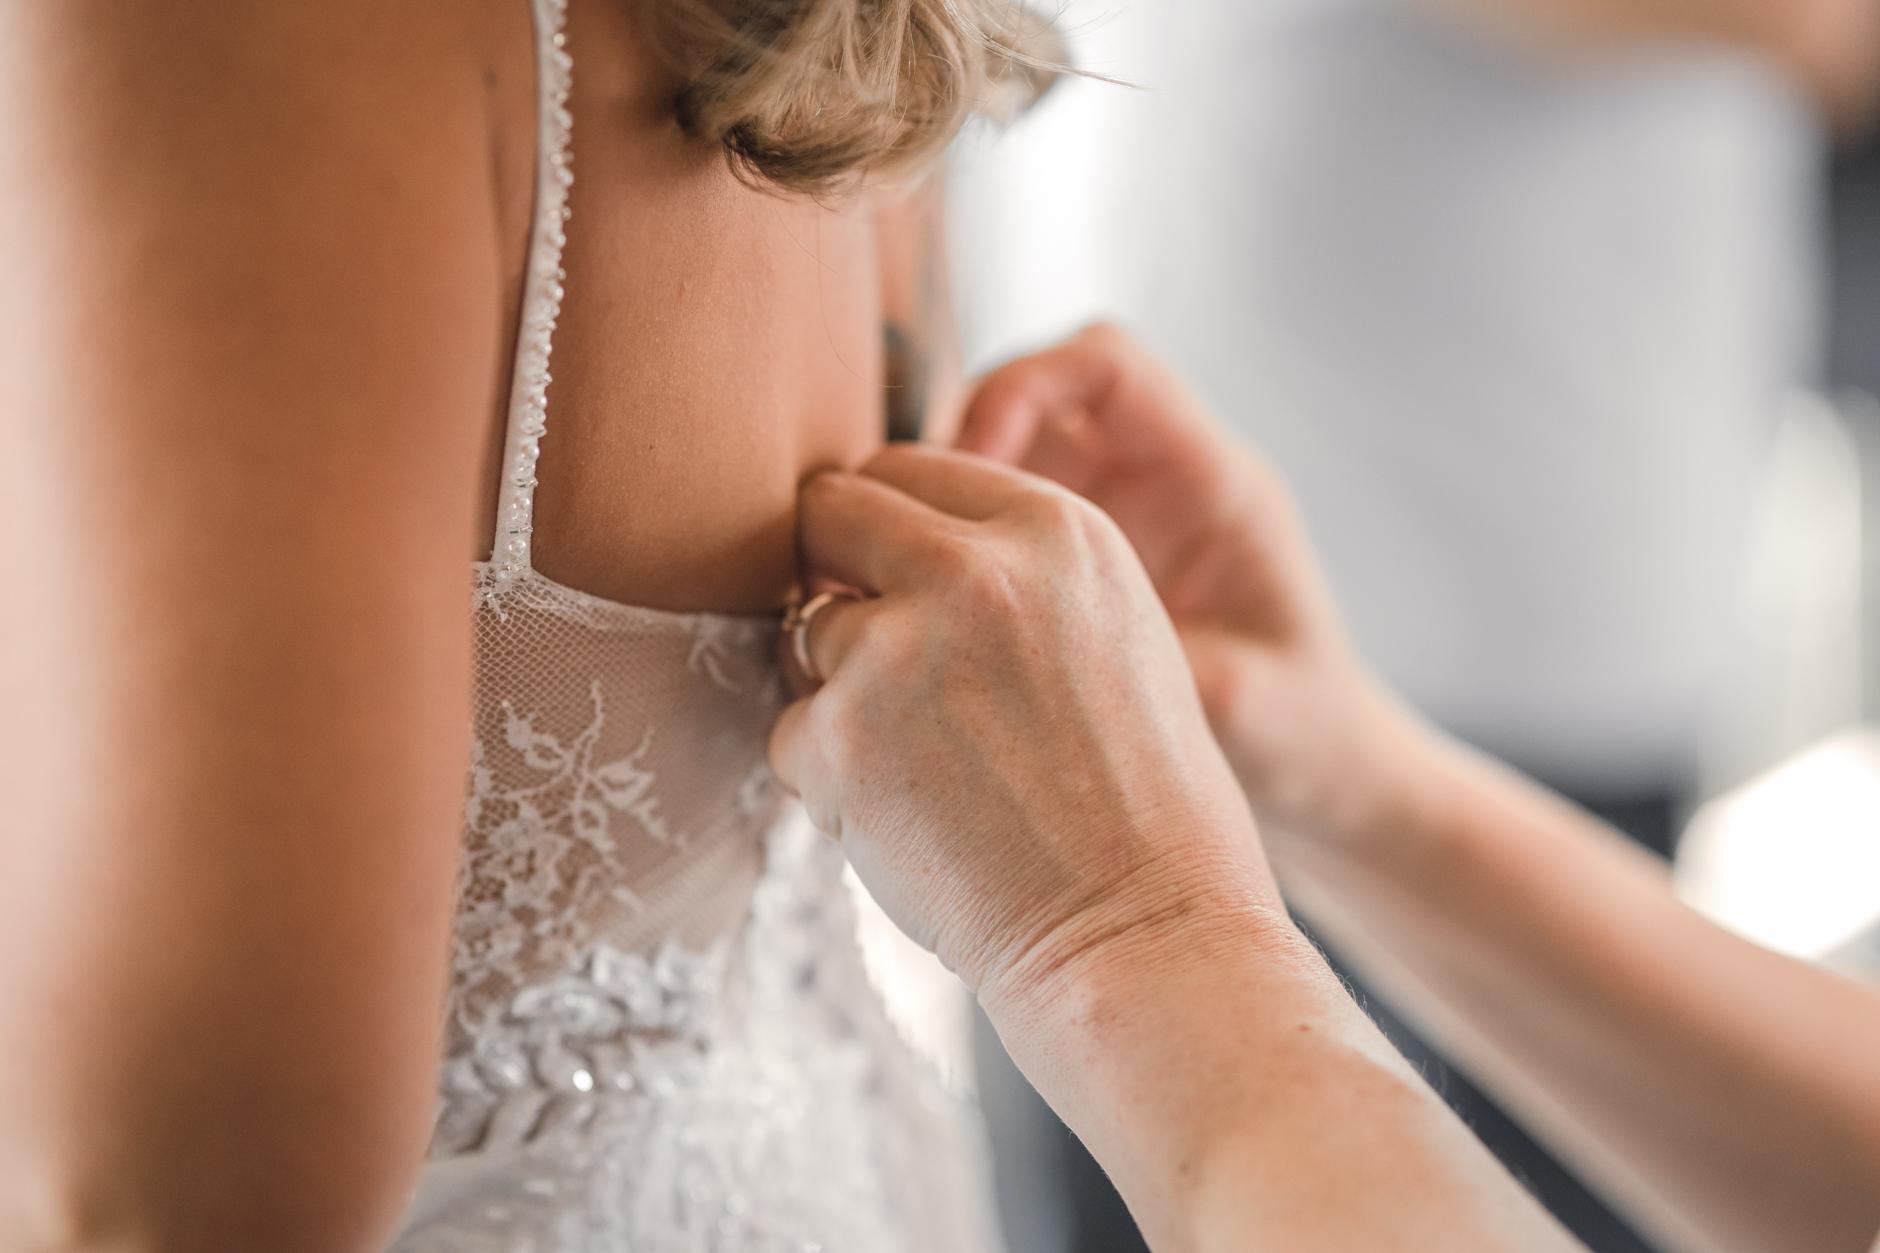 letztes Handanlegen am Brautkleid